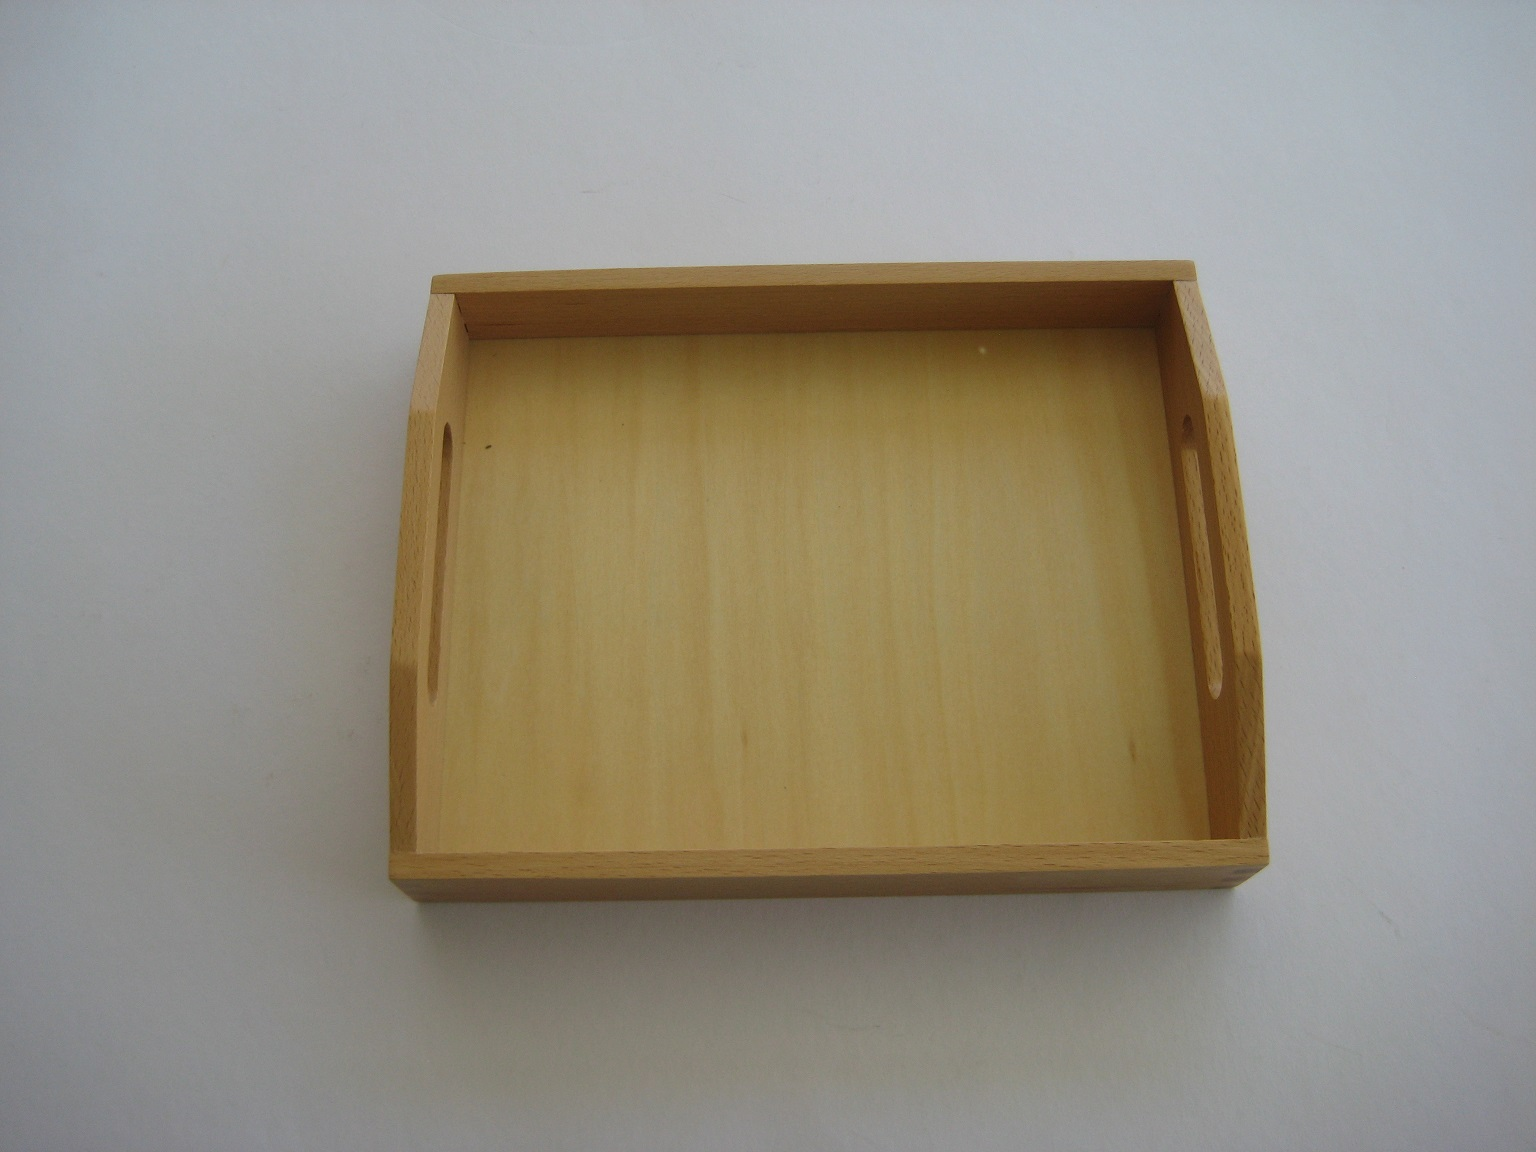 small-wooden-tray-1.jpg